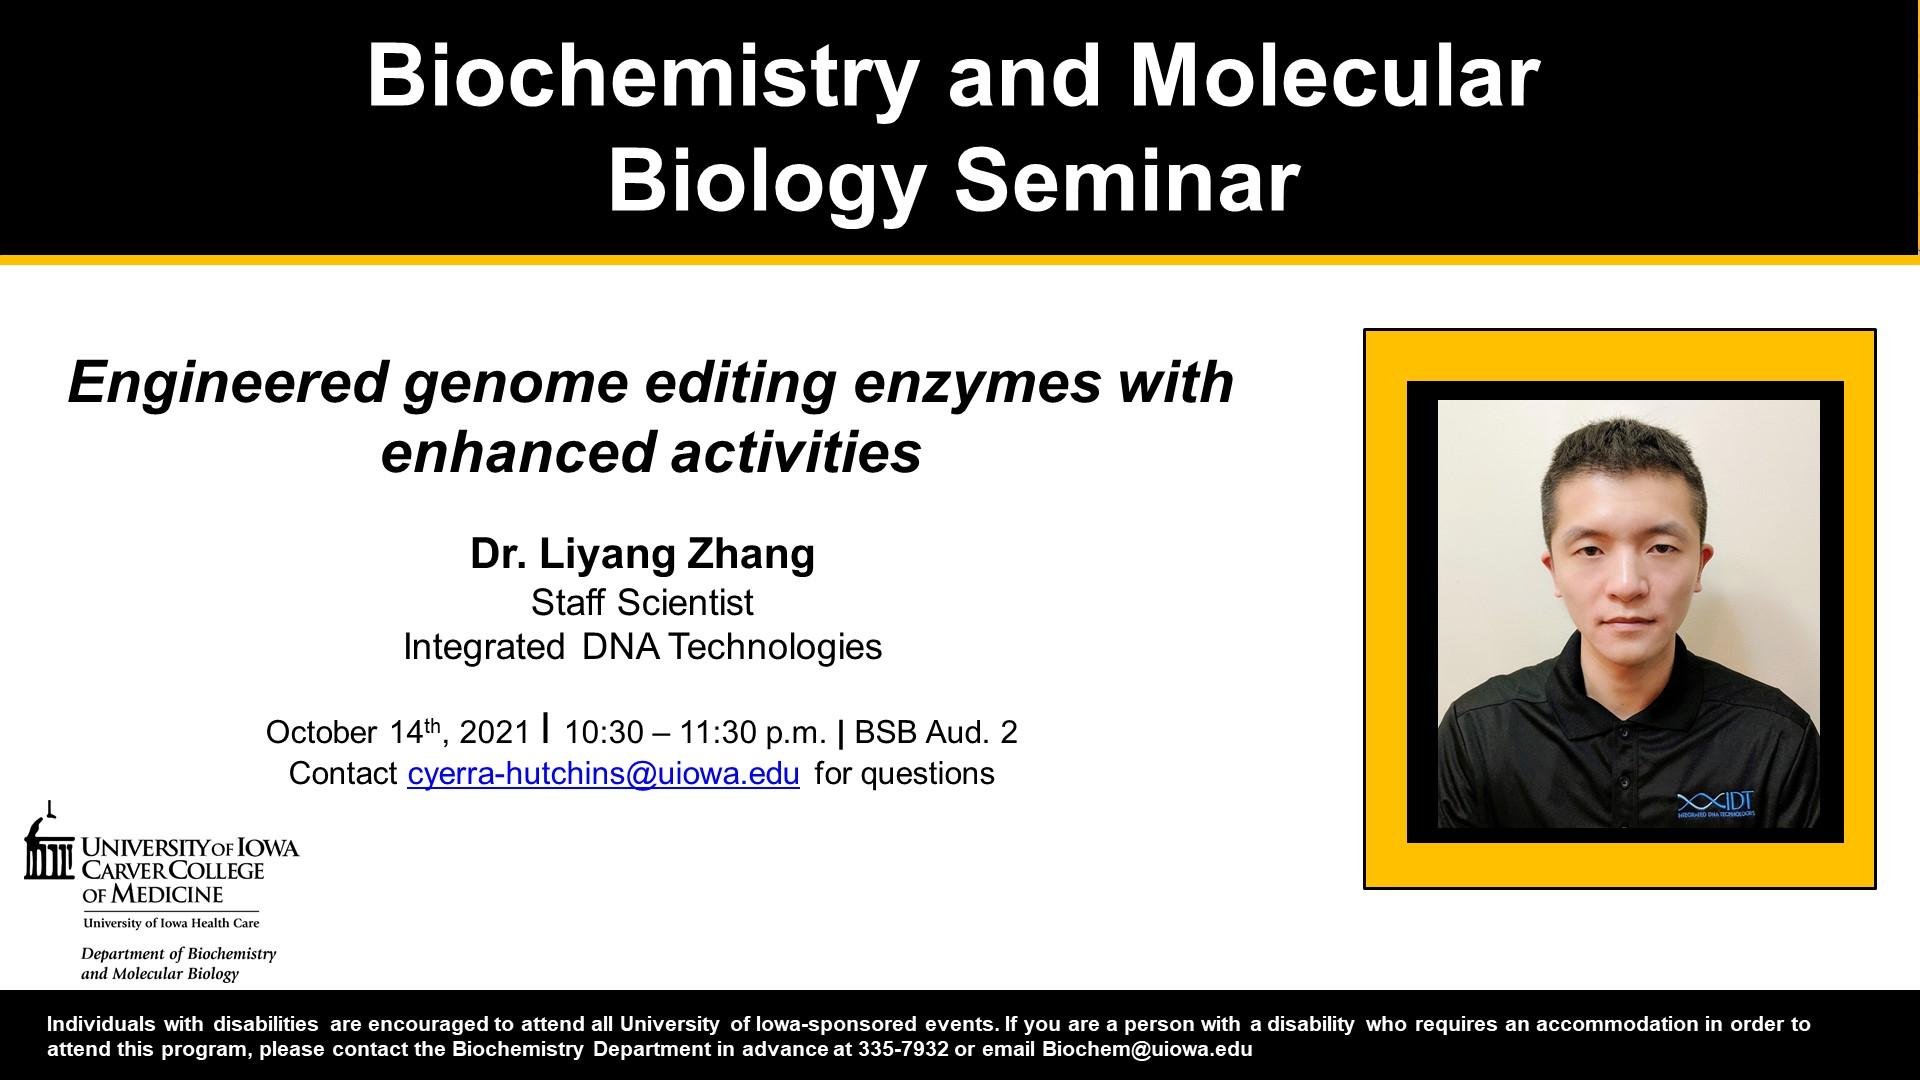 Biochemistry Seminar: Dr. Liyang Zhang promotional image